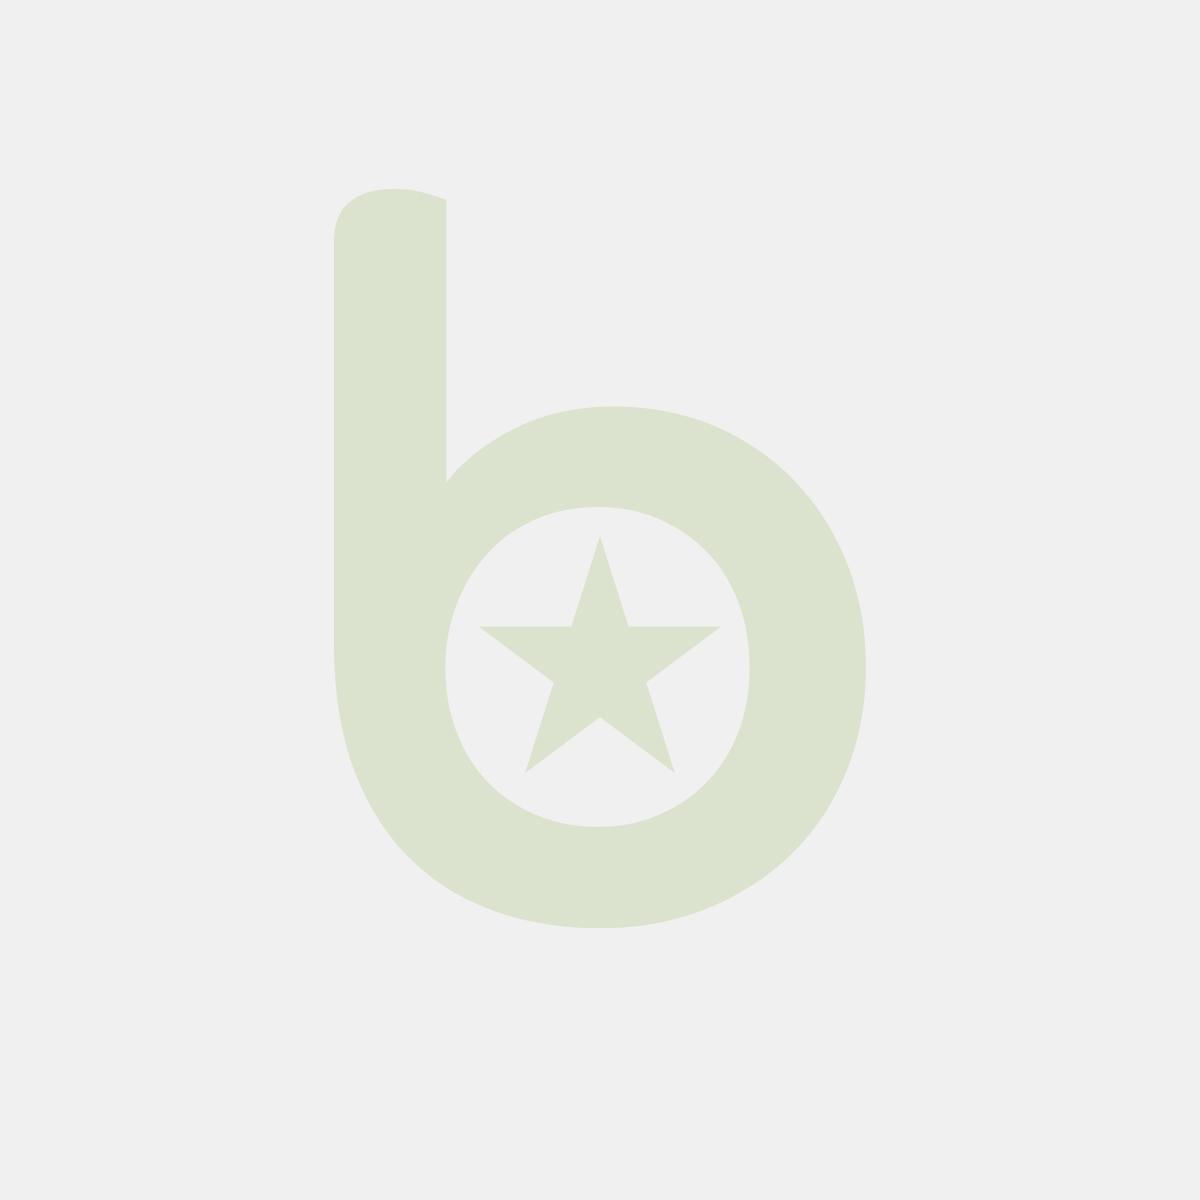 Niszczarka REXEL Silencio V30WS, paski, P-2, 8 kart., 18l, czarna